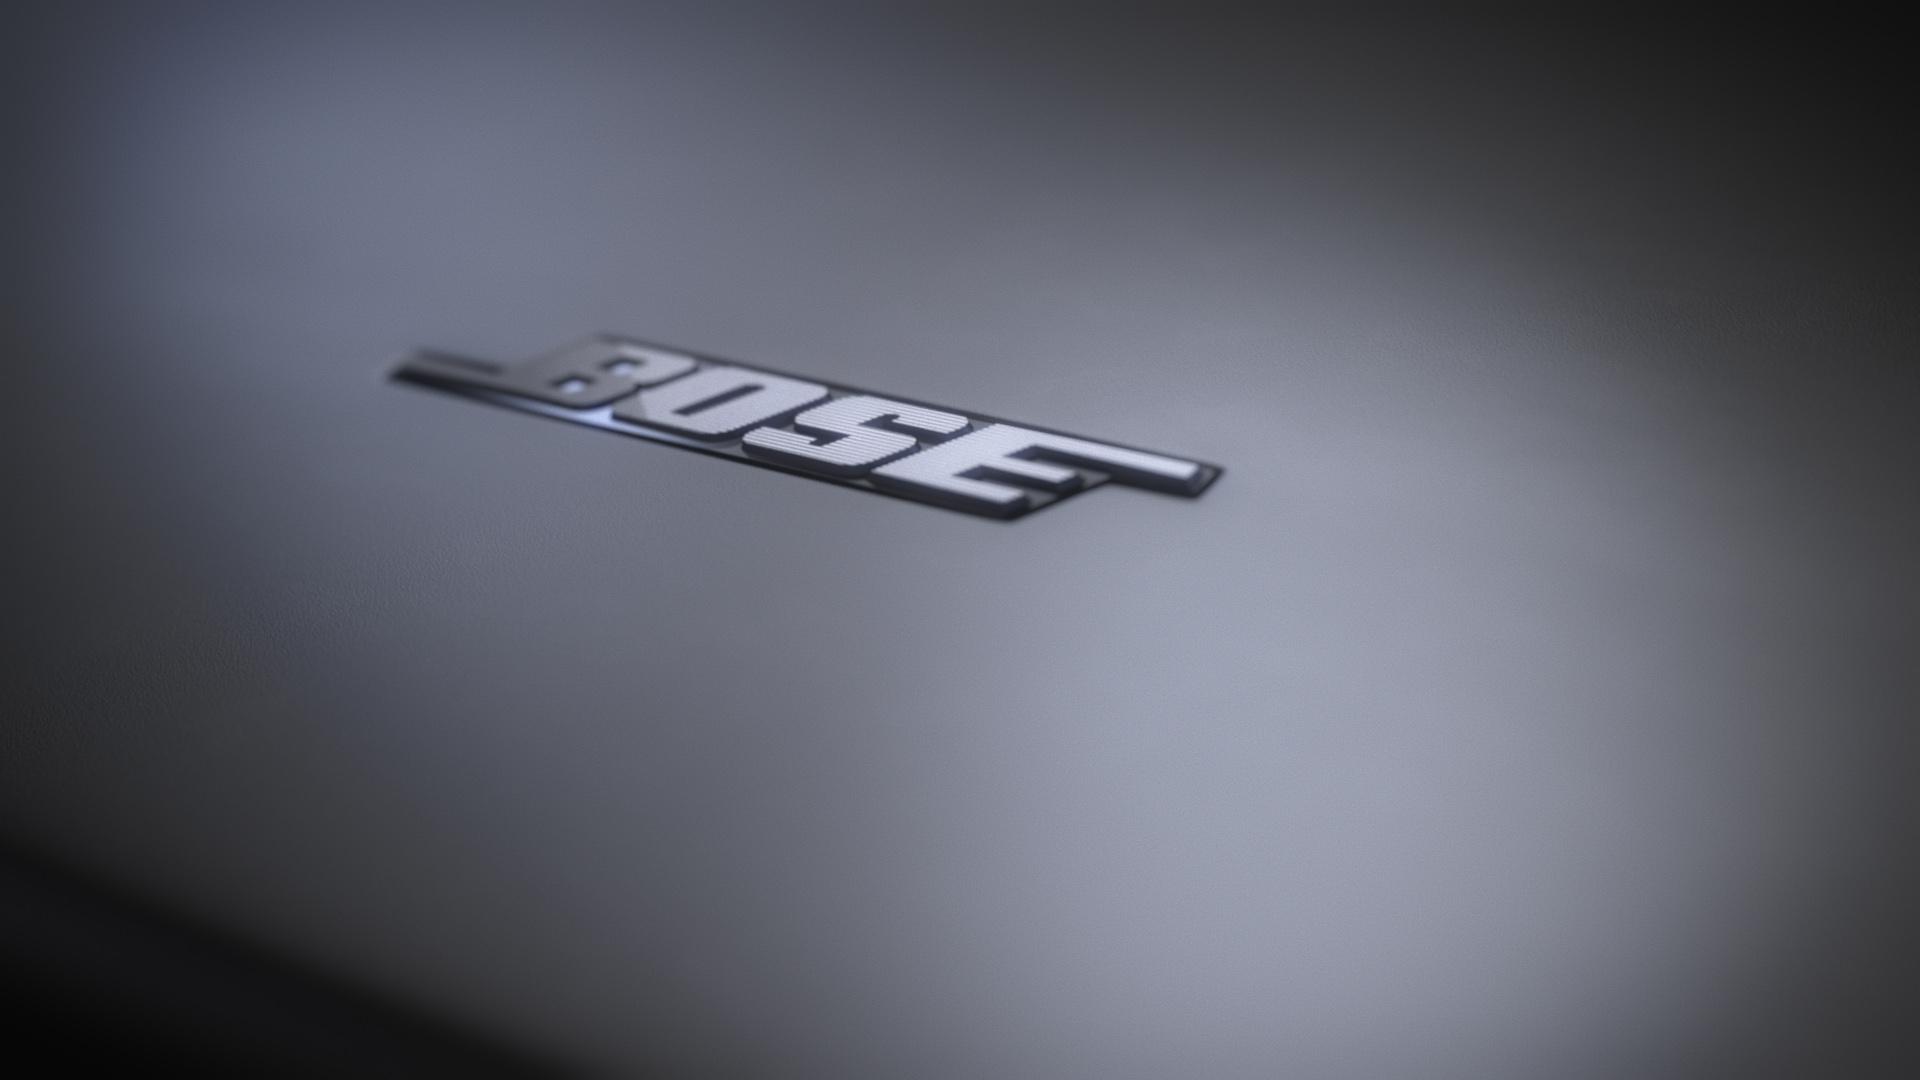 Wallpaper Desktop 3d Hd Car Todd Kumpf 3d Generalist 2017